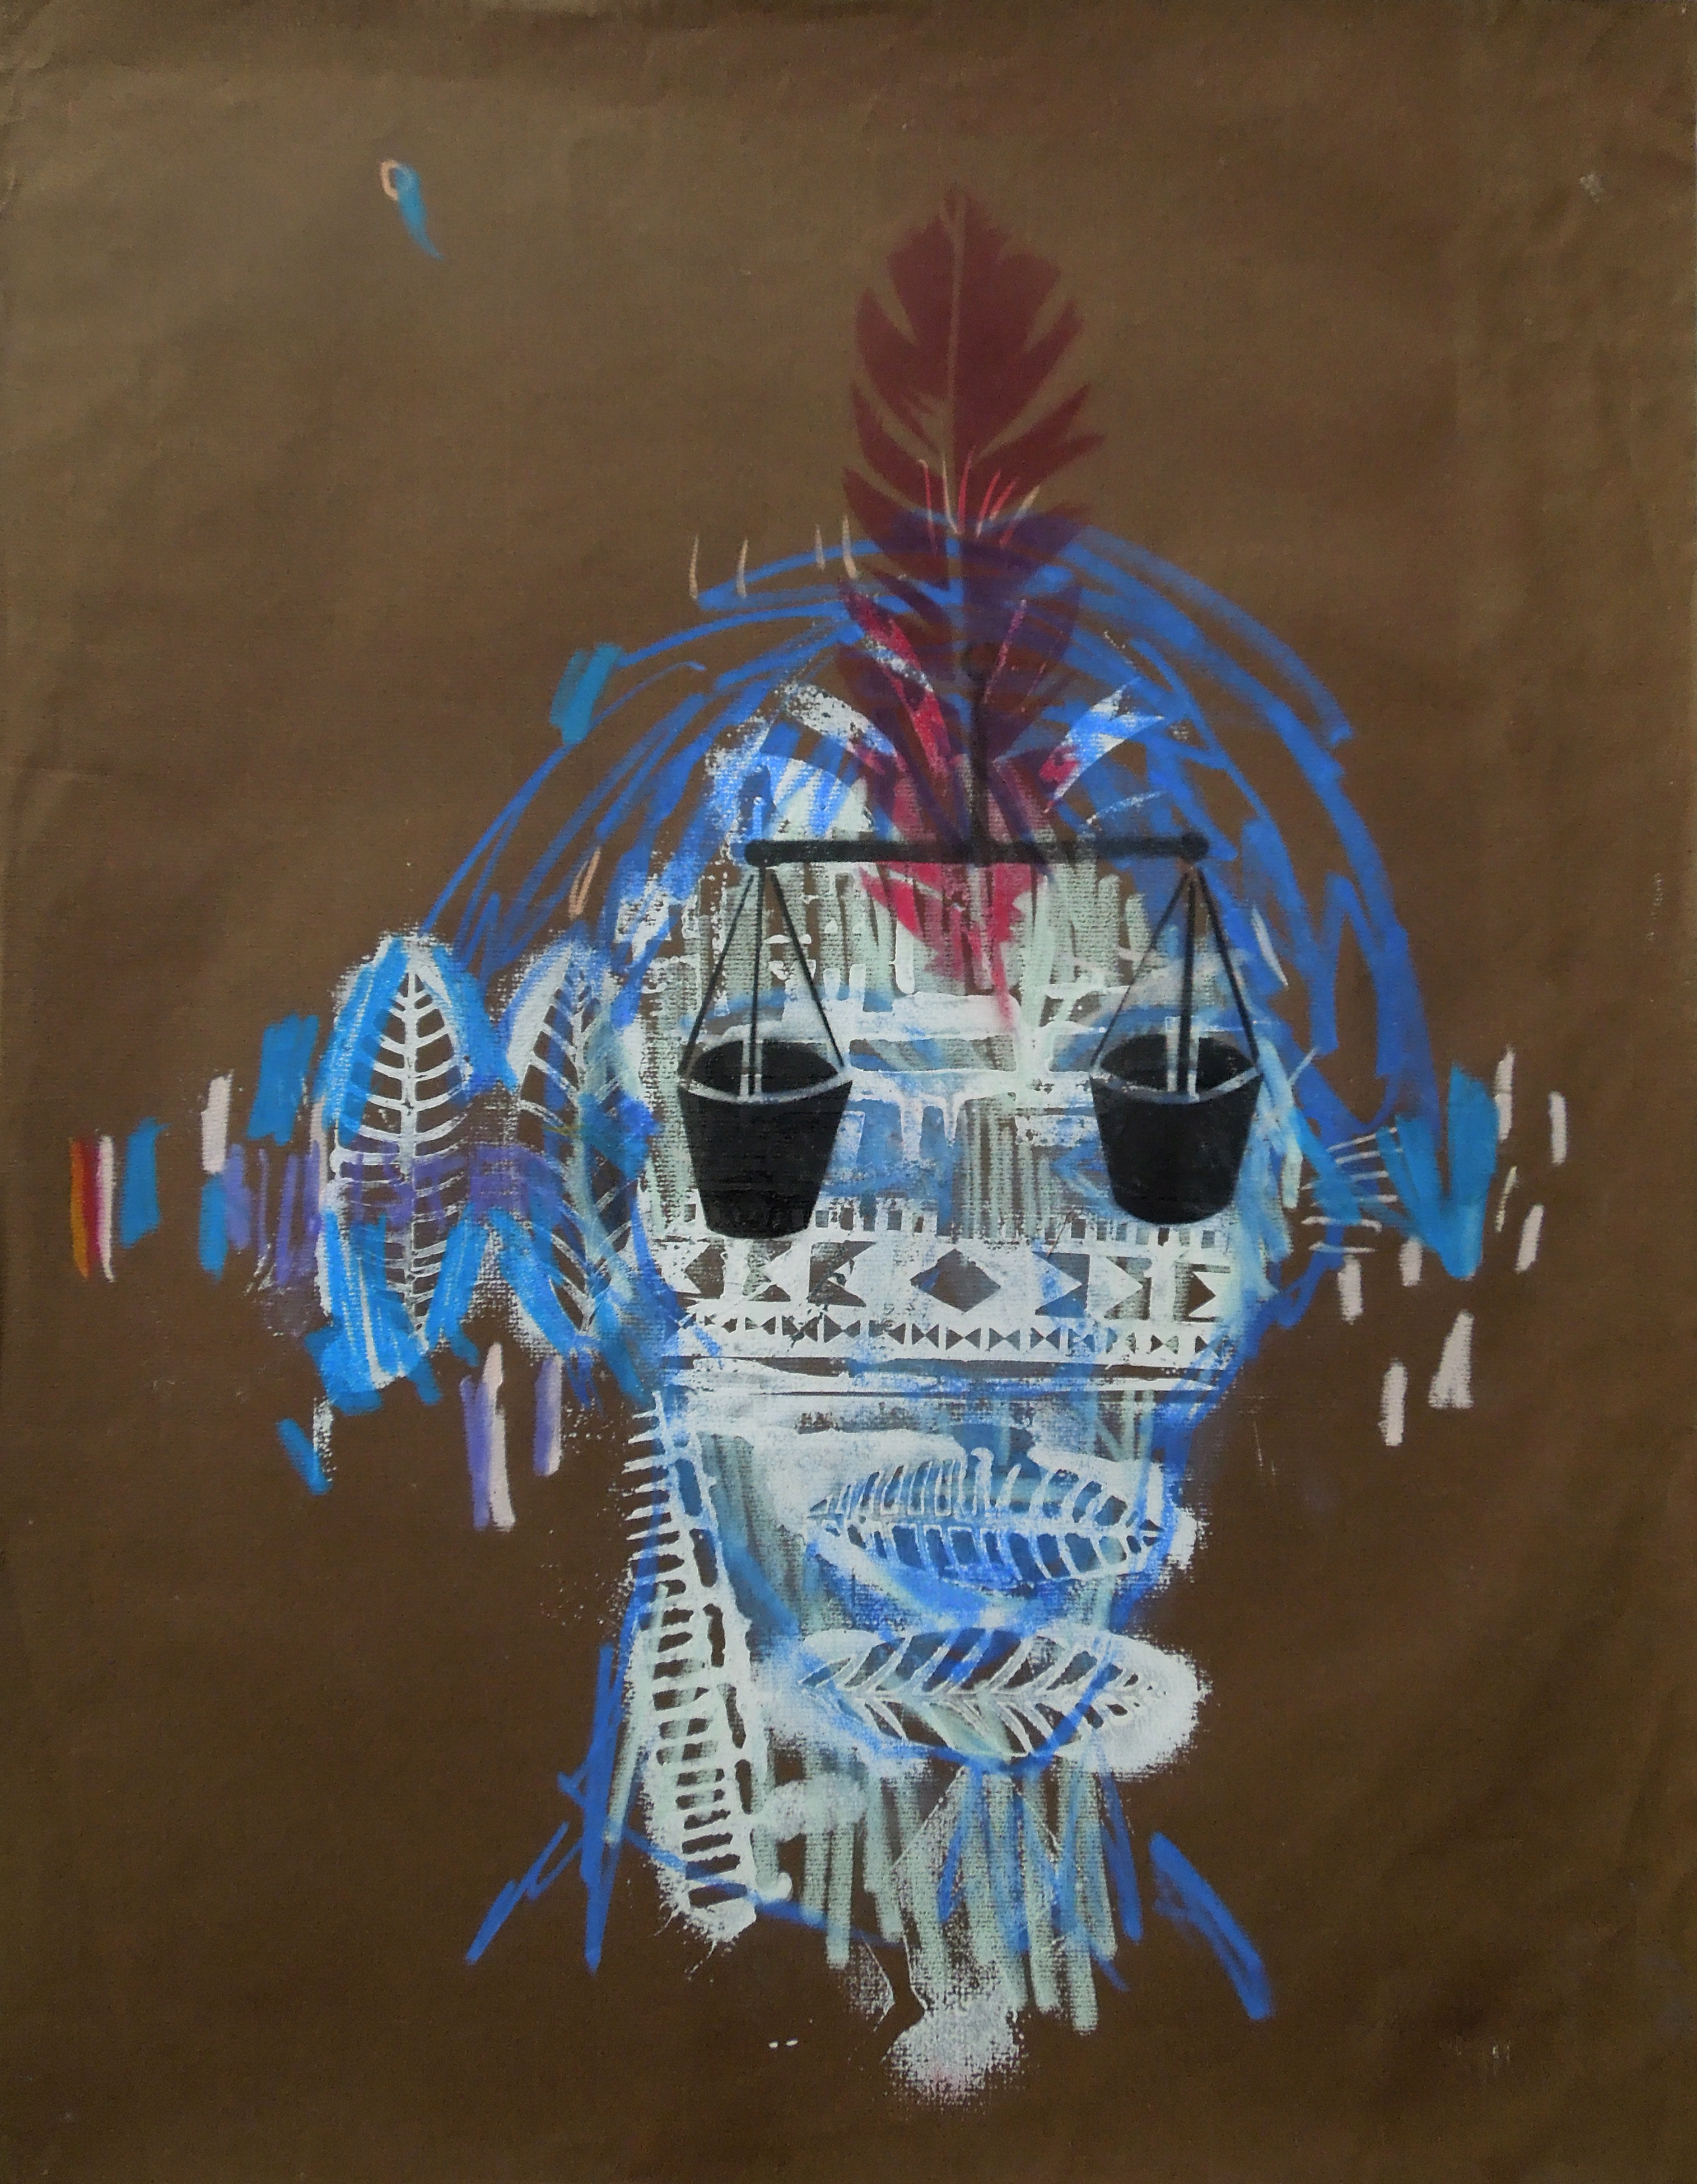 Selfportrait(bluebrown)64x50cm